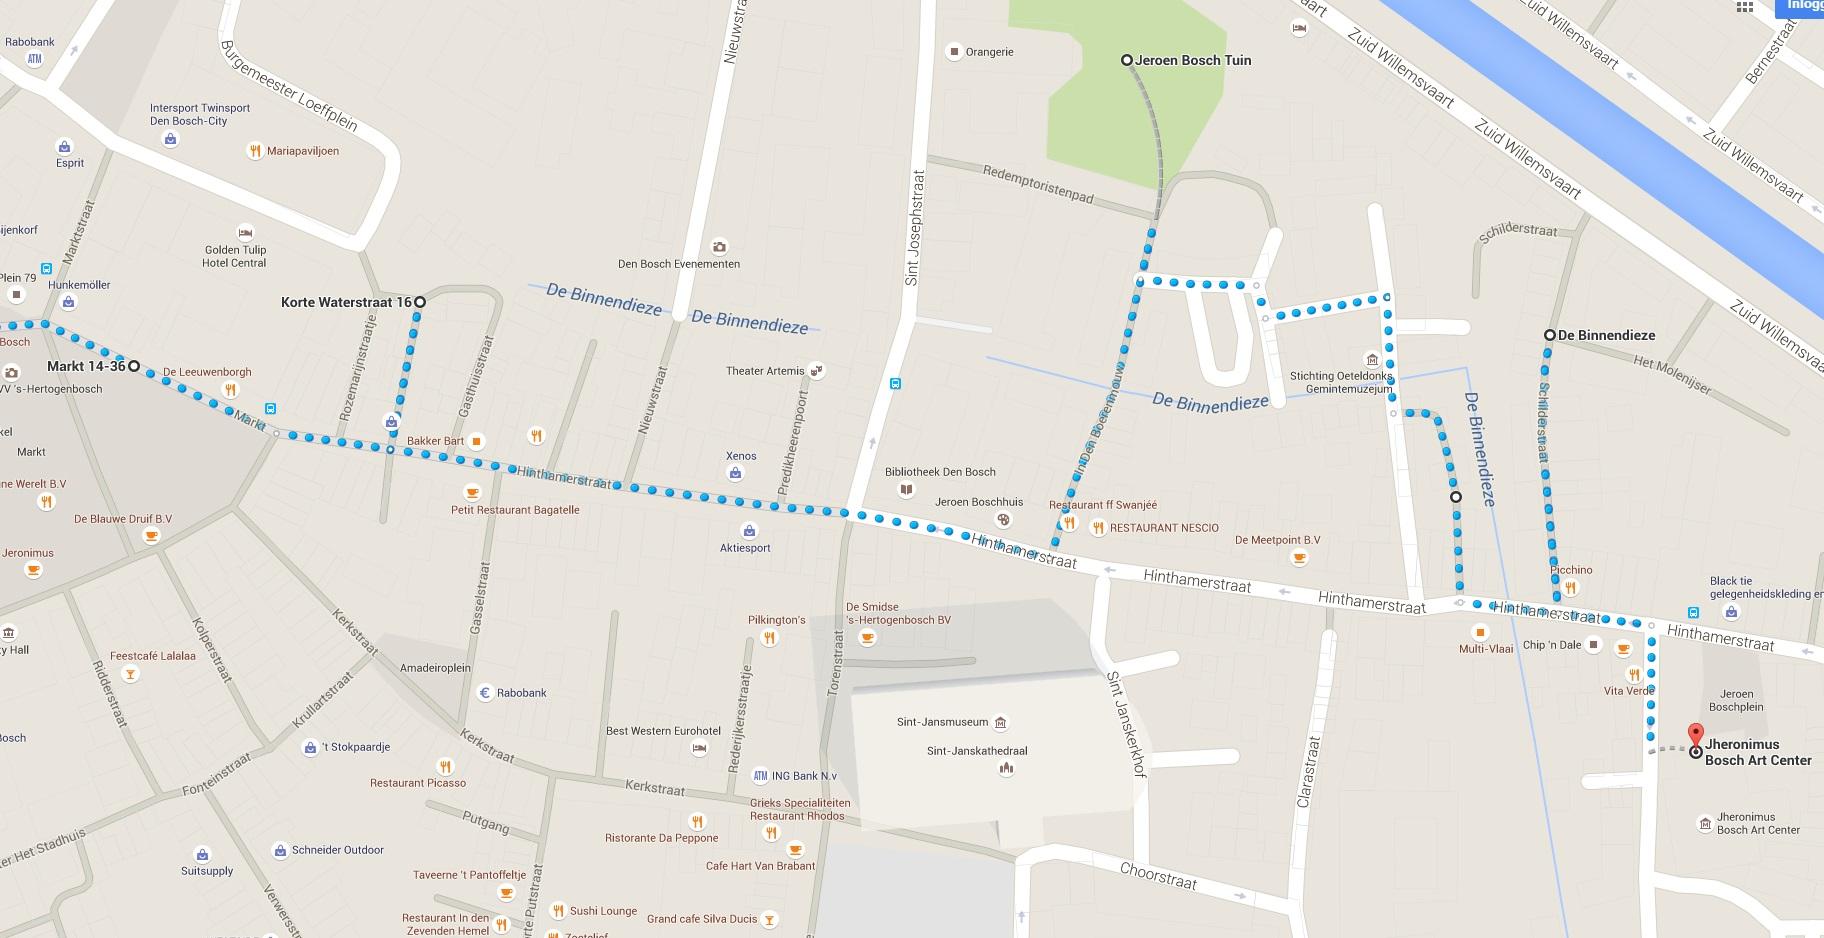 Stadswandeling Jeroen Bosch 2 - Den Bosch Tips